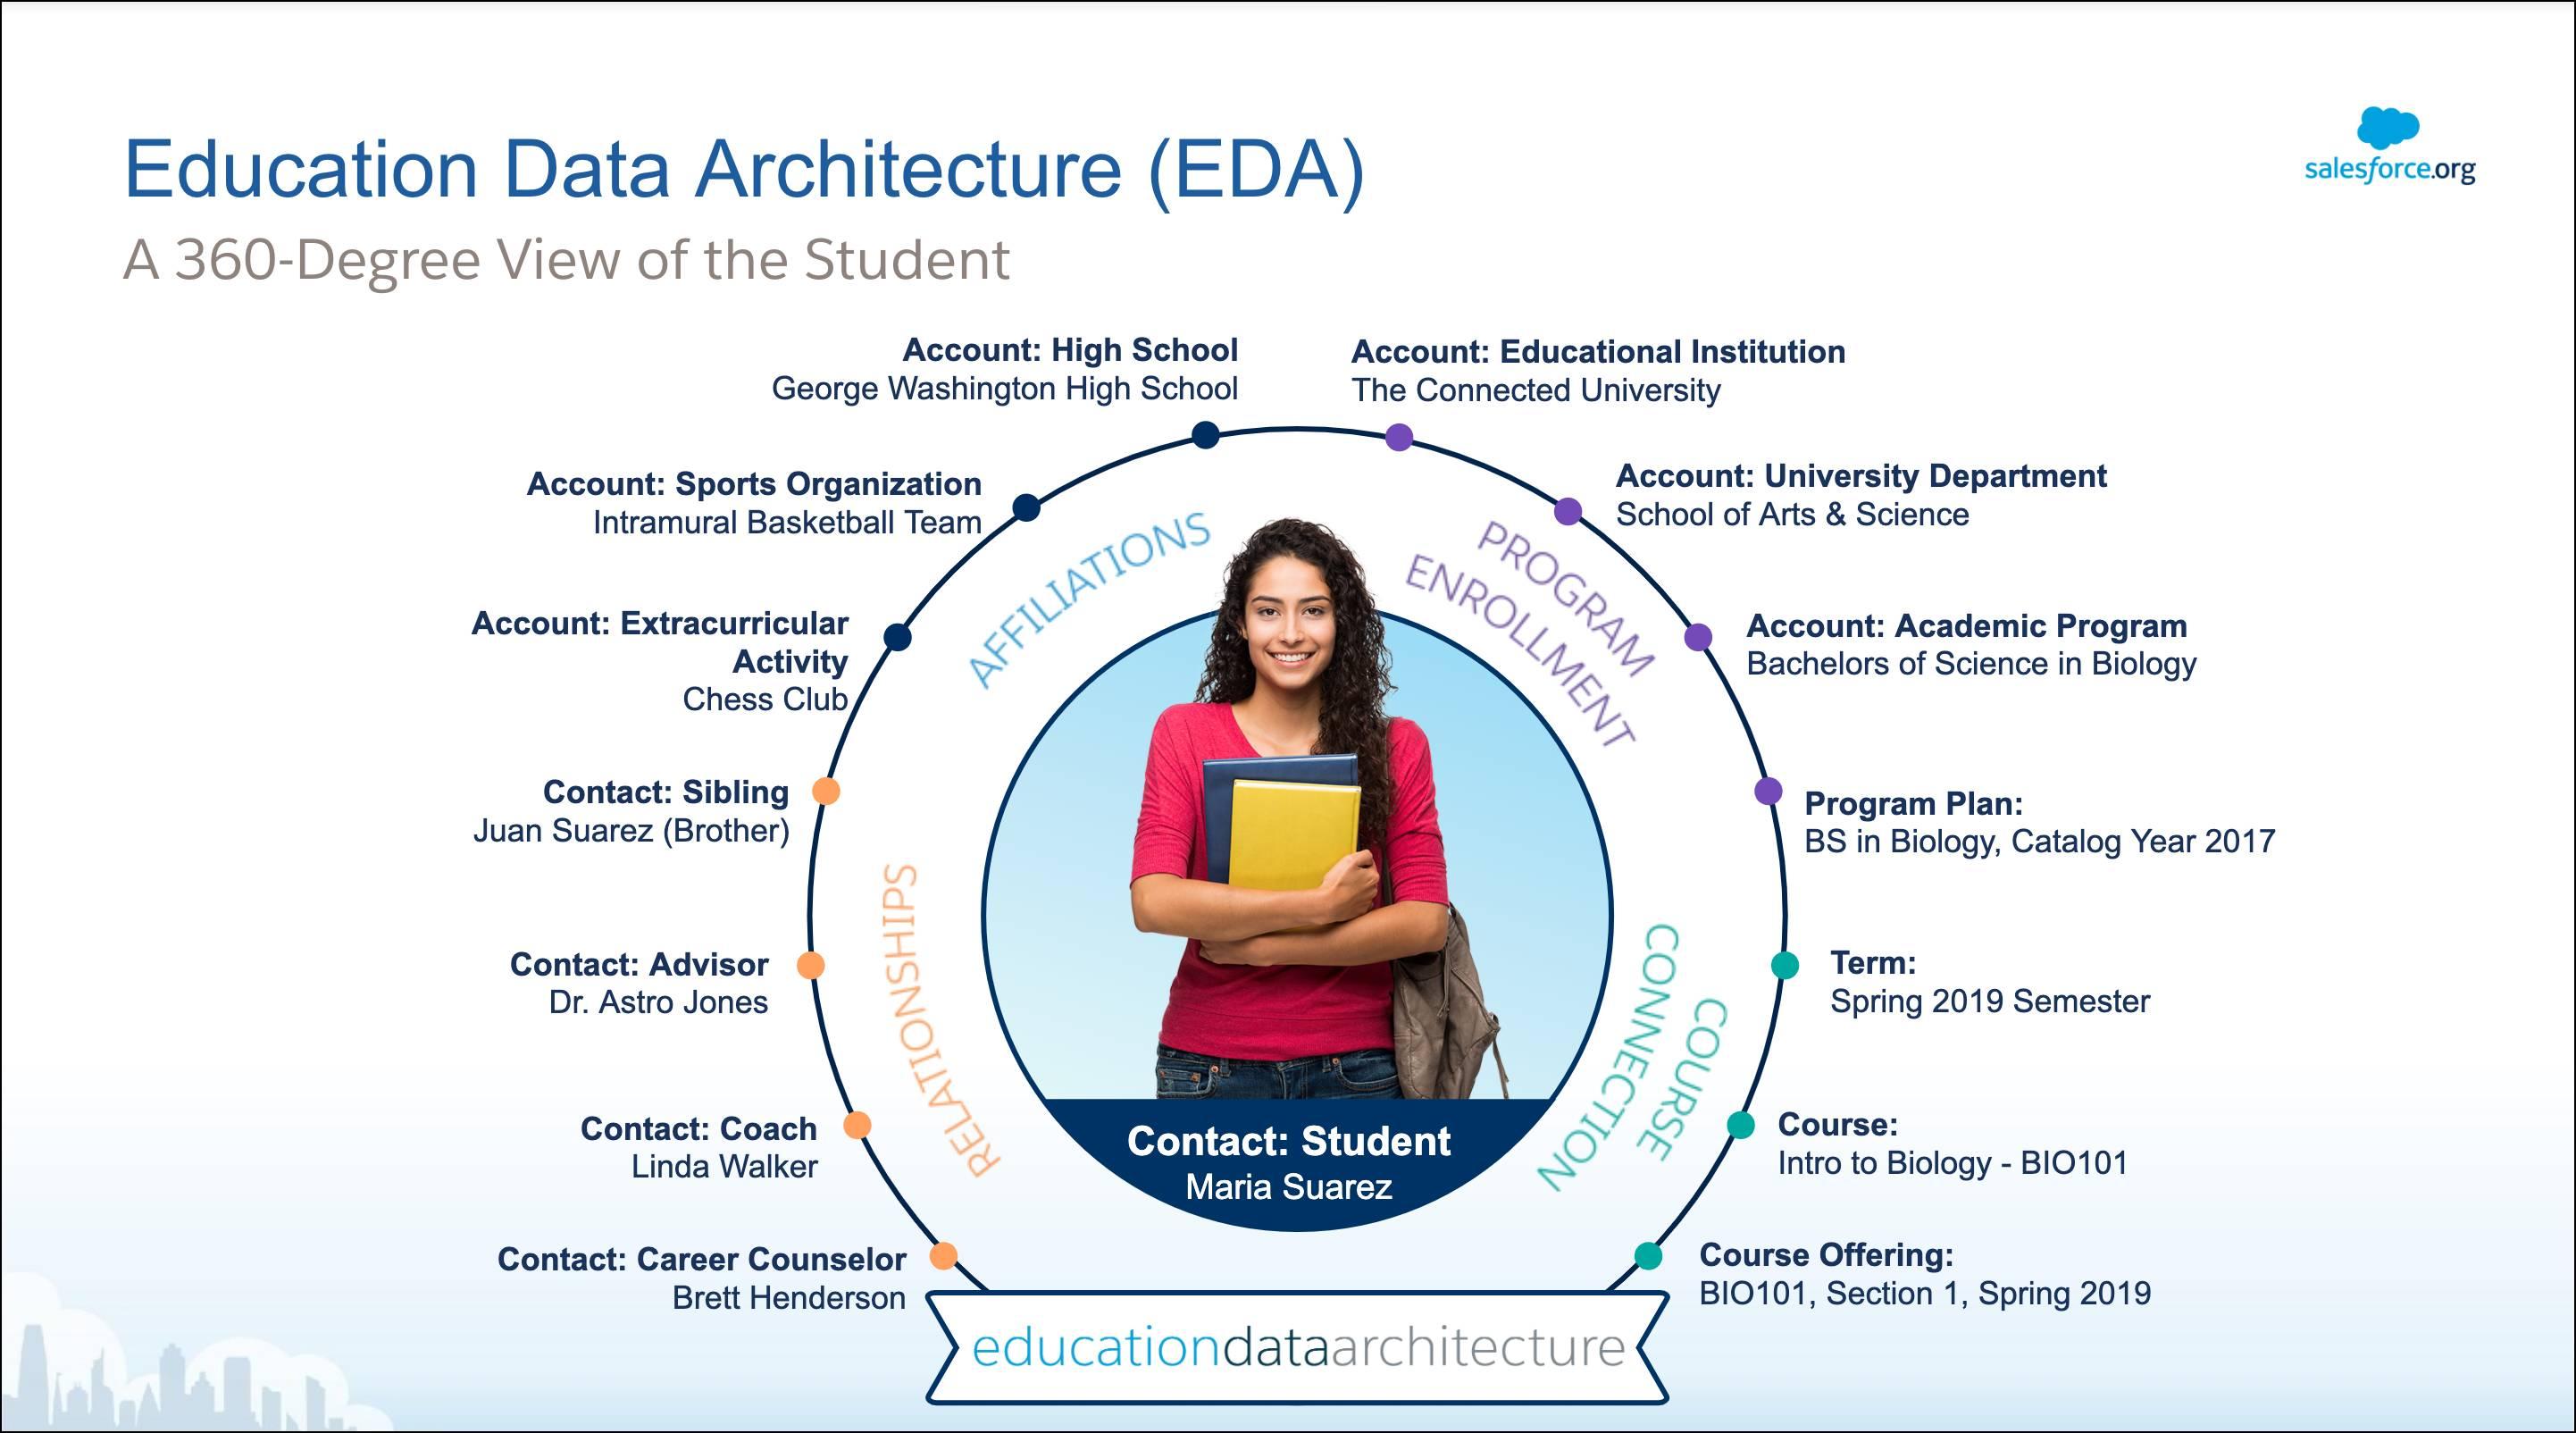 Education Data Architecture (EDA) では、リレーション、アフィリエーション、専攻課程、履修科目などのコンポーネントによって生徒の全体像を把握できます。